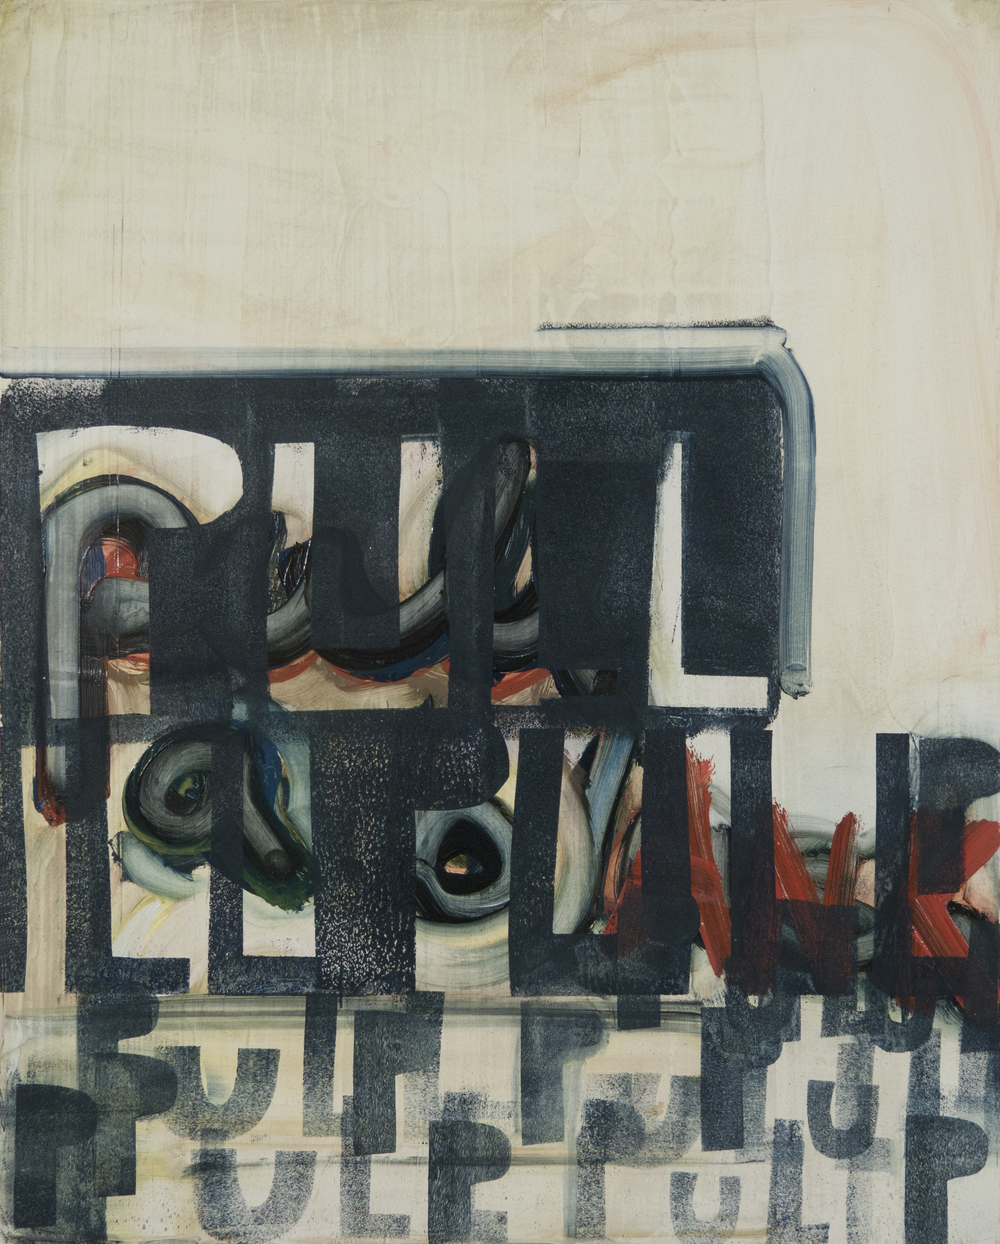 Pull/blank, 2012